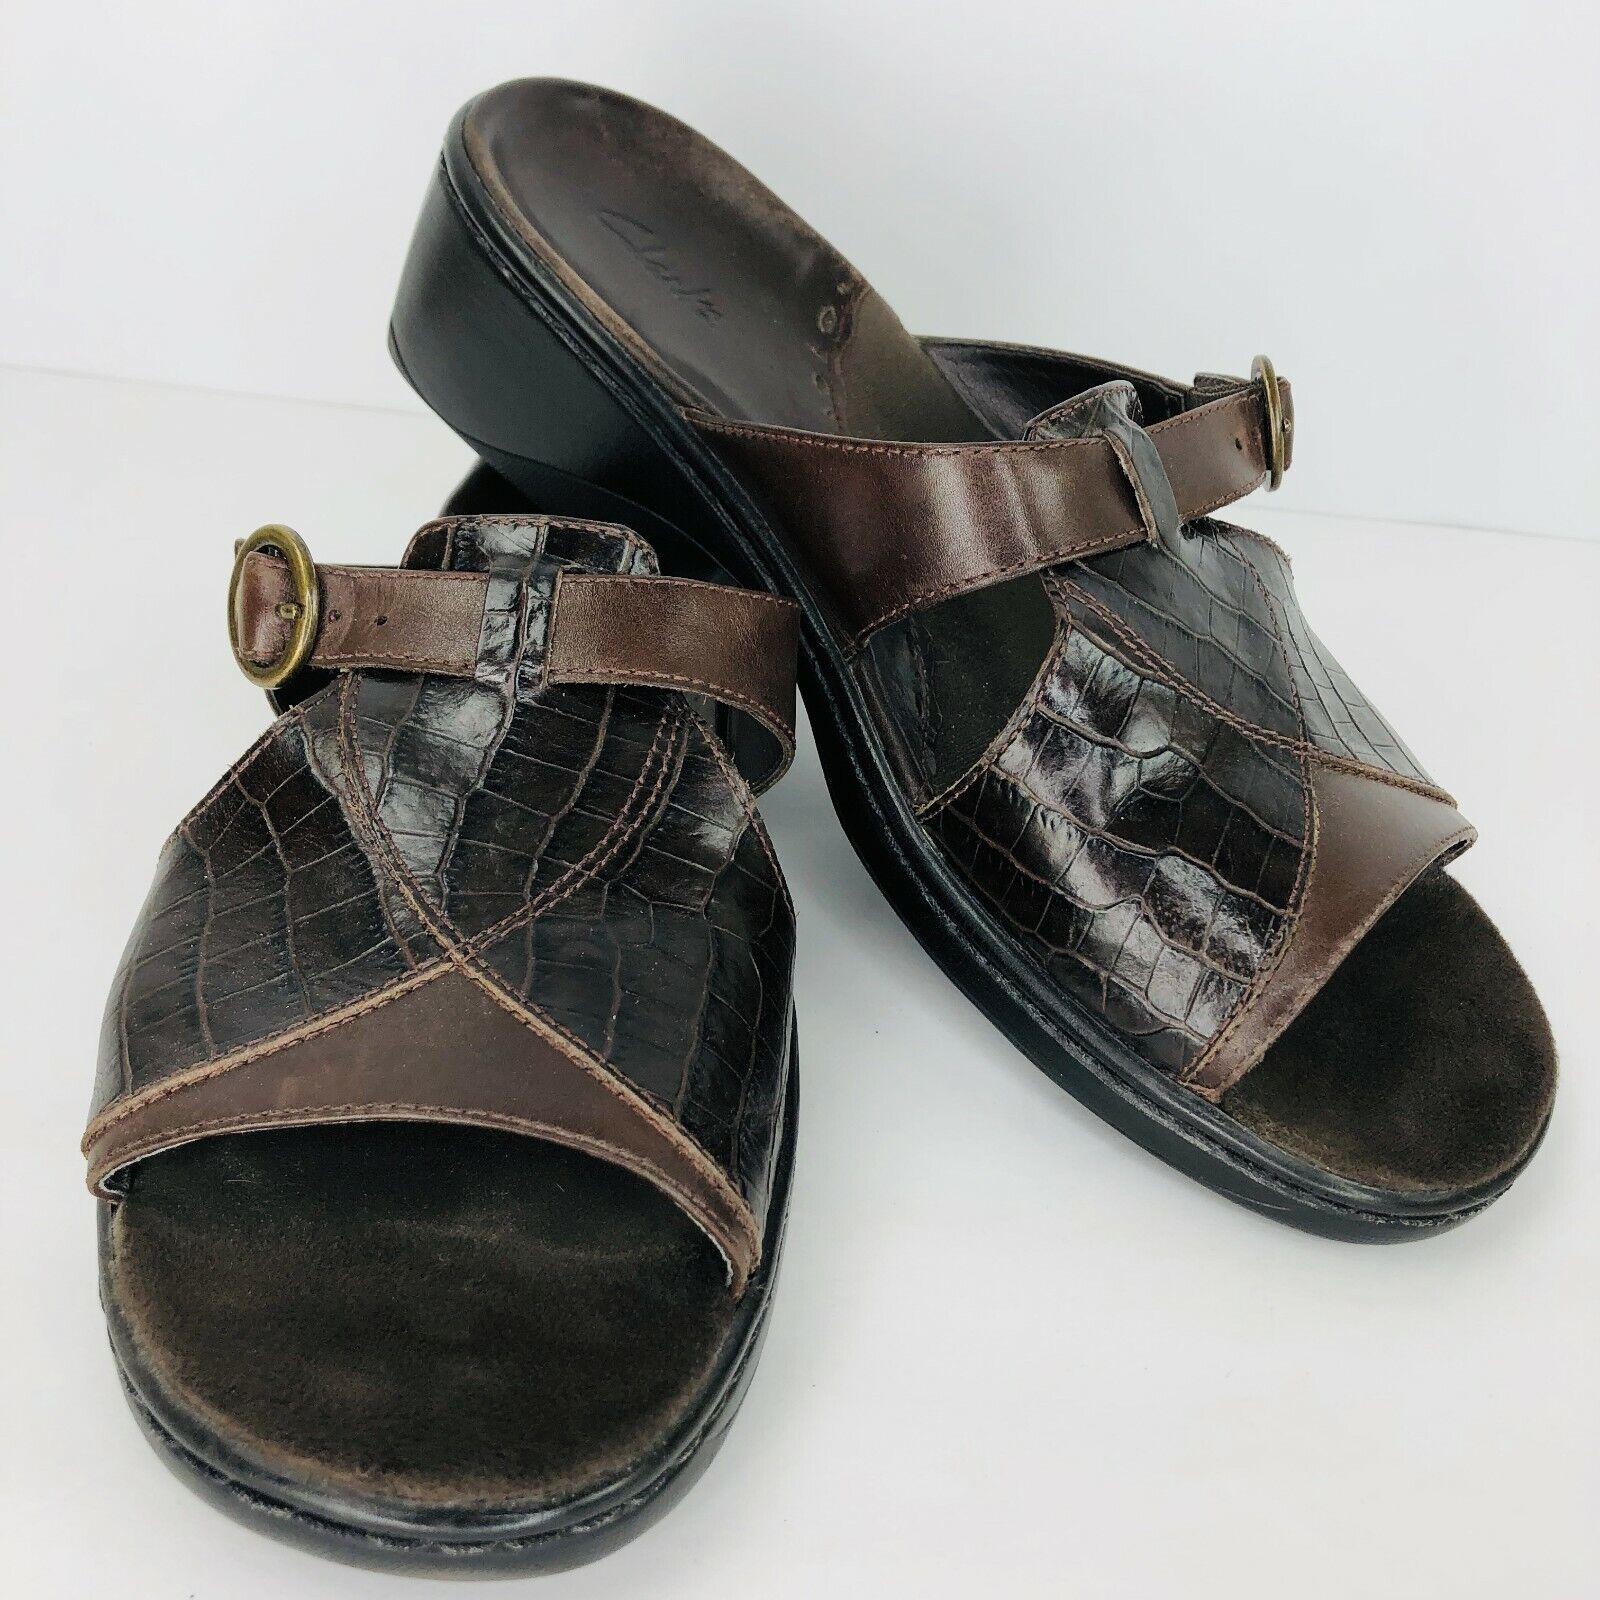 Clarks Ladybelle Slides Sandals Cafe Brown Leather Womens Size 9 W  71812